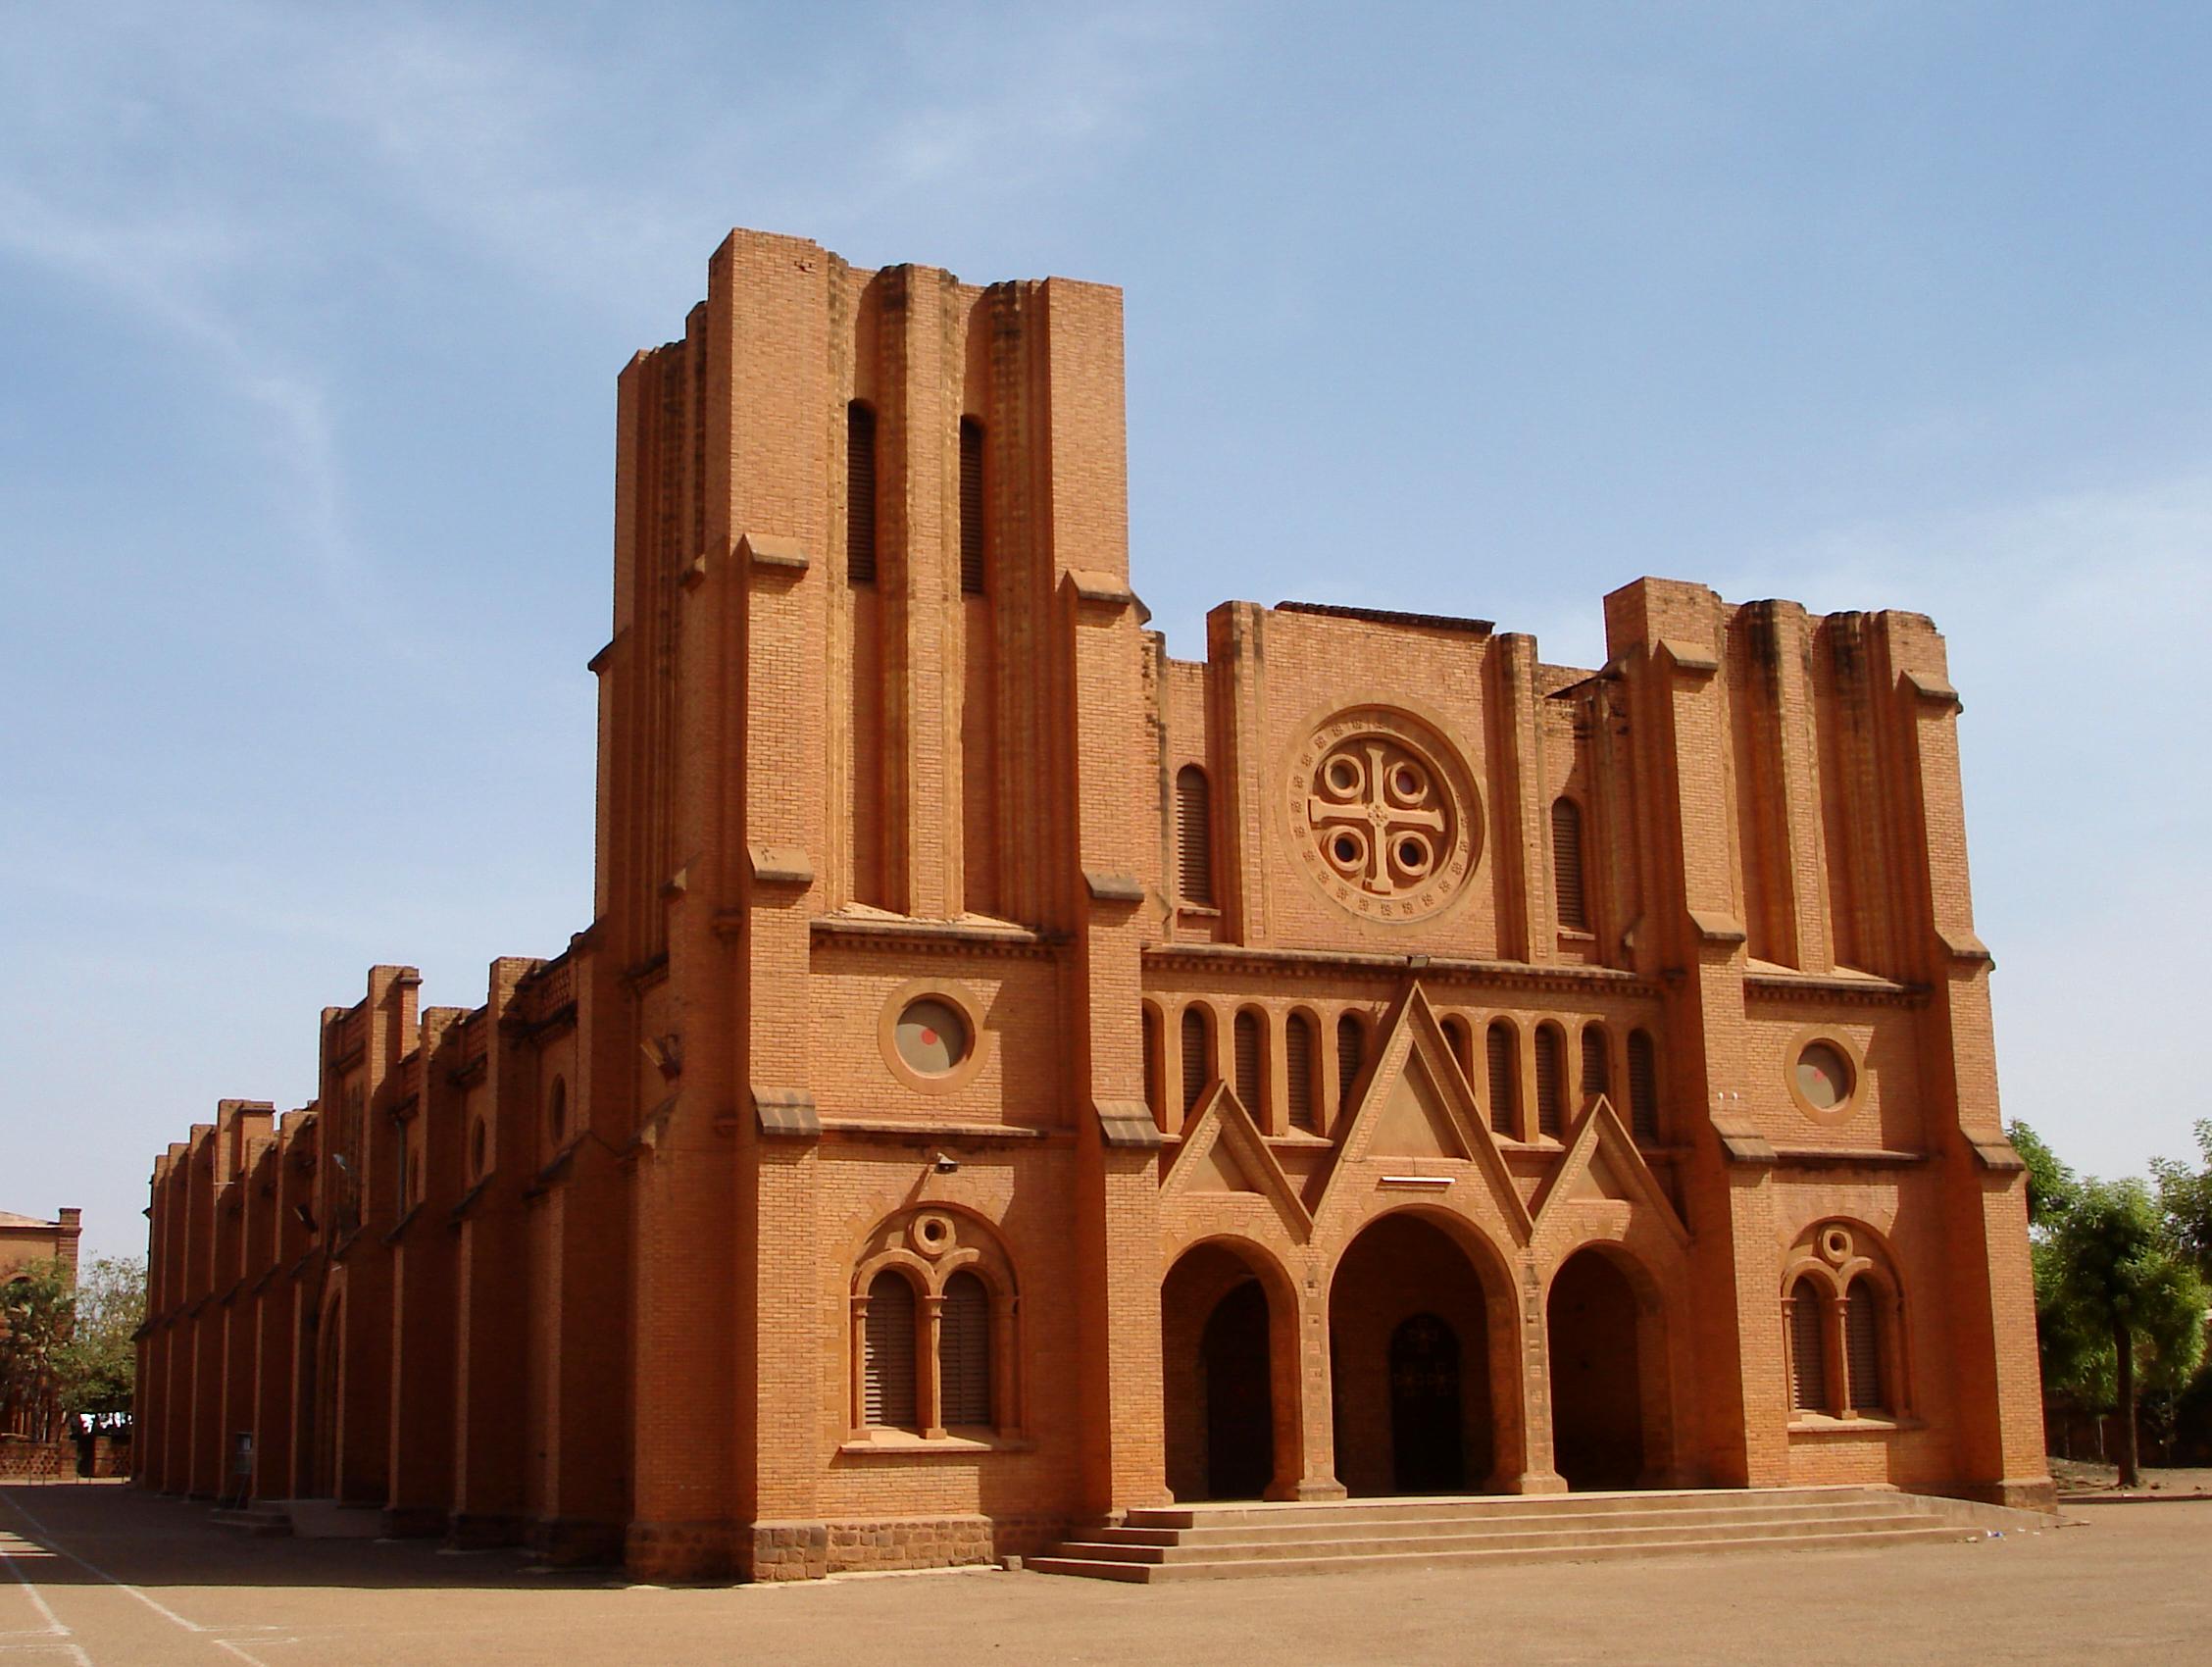 http://upload.wikimedia.org/wikipedia/commons/e/e3/Ouagacathedrale.png